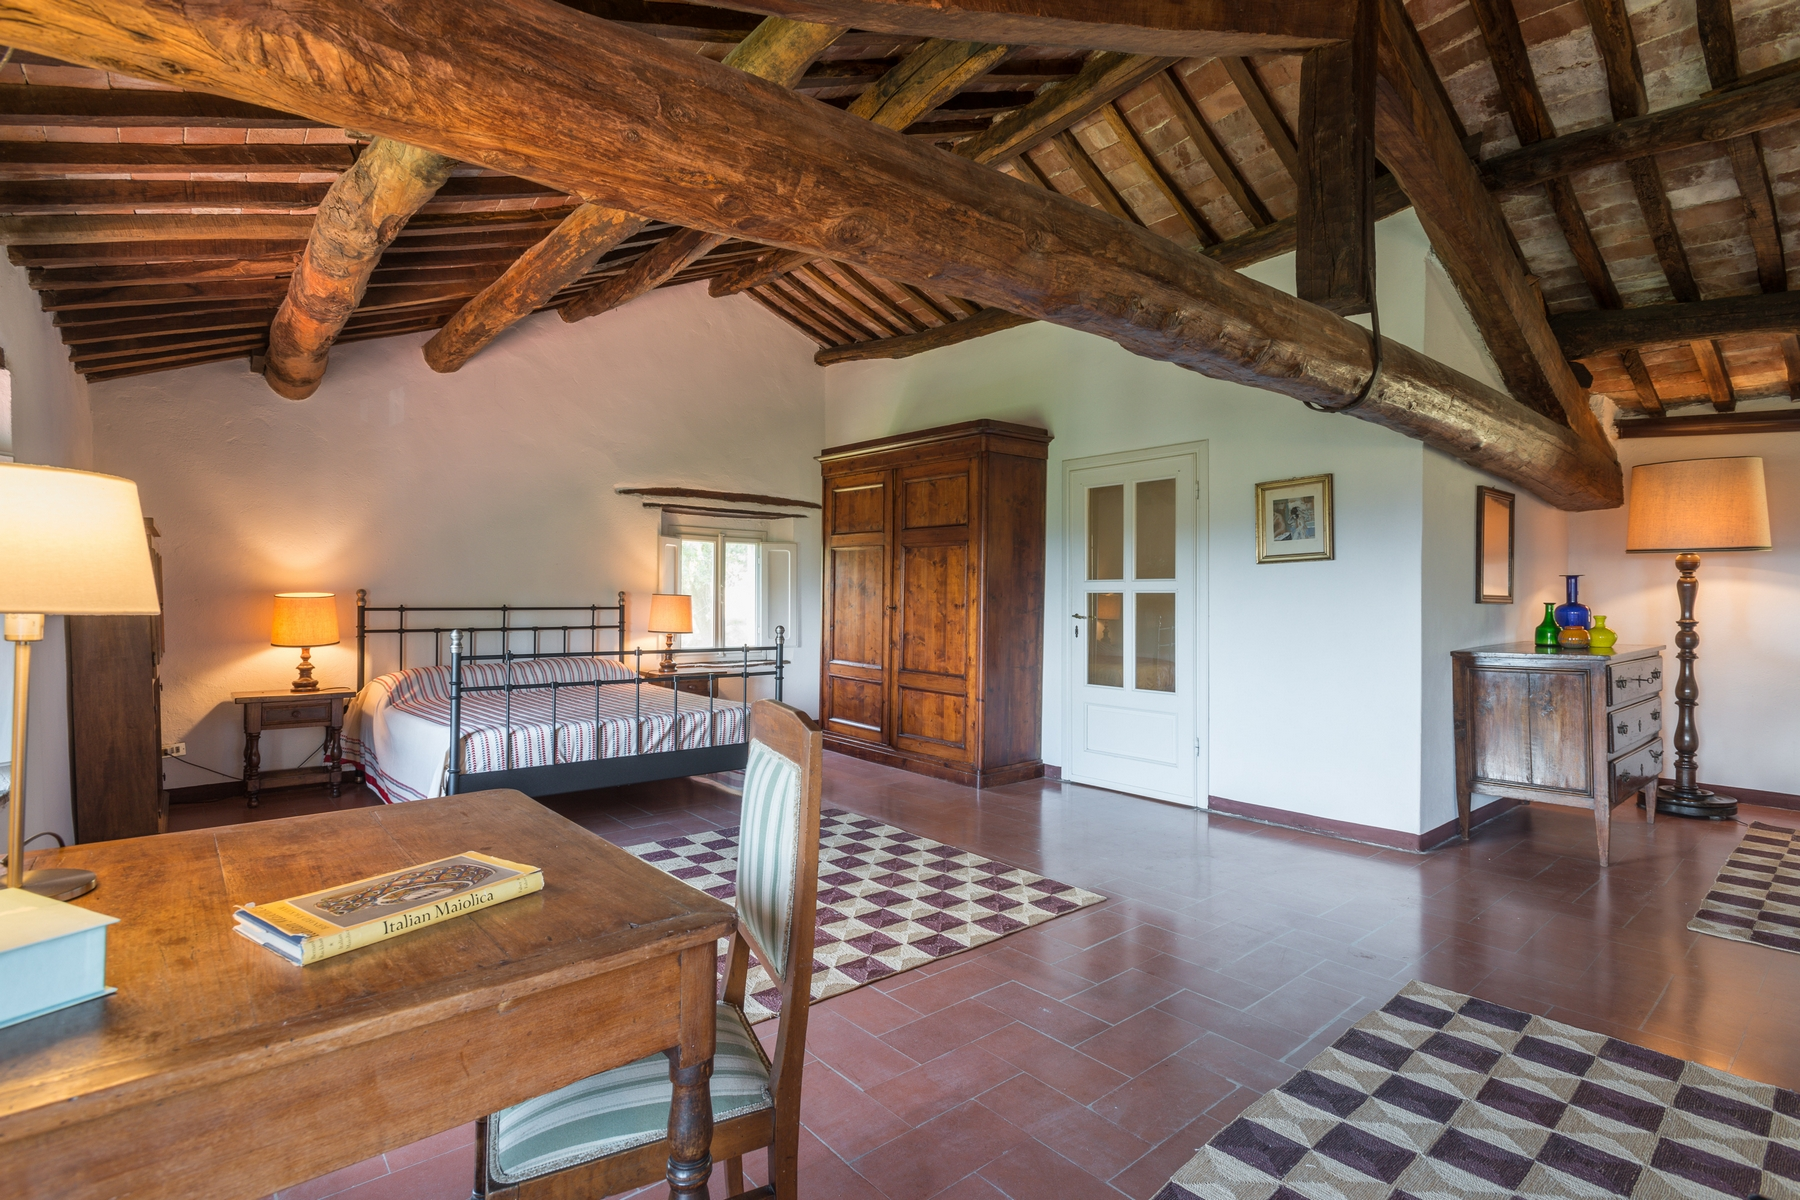 Villa in Vendita a Lucca: 5 locali, 550 mq - Foto 17